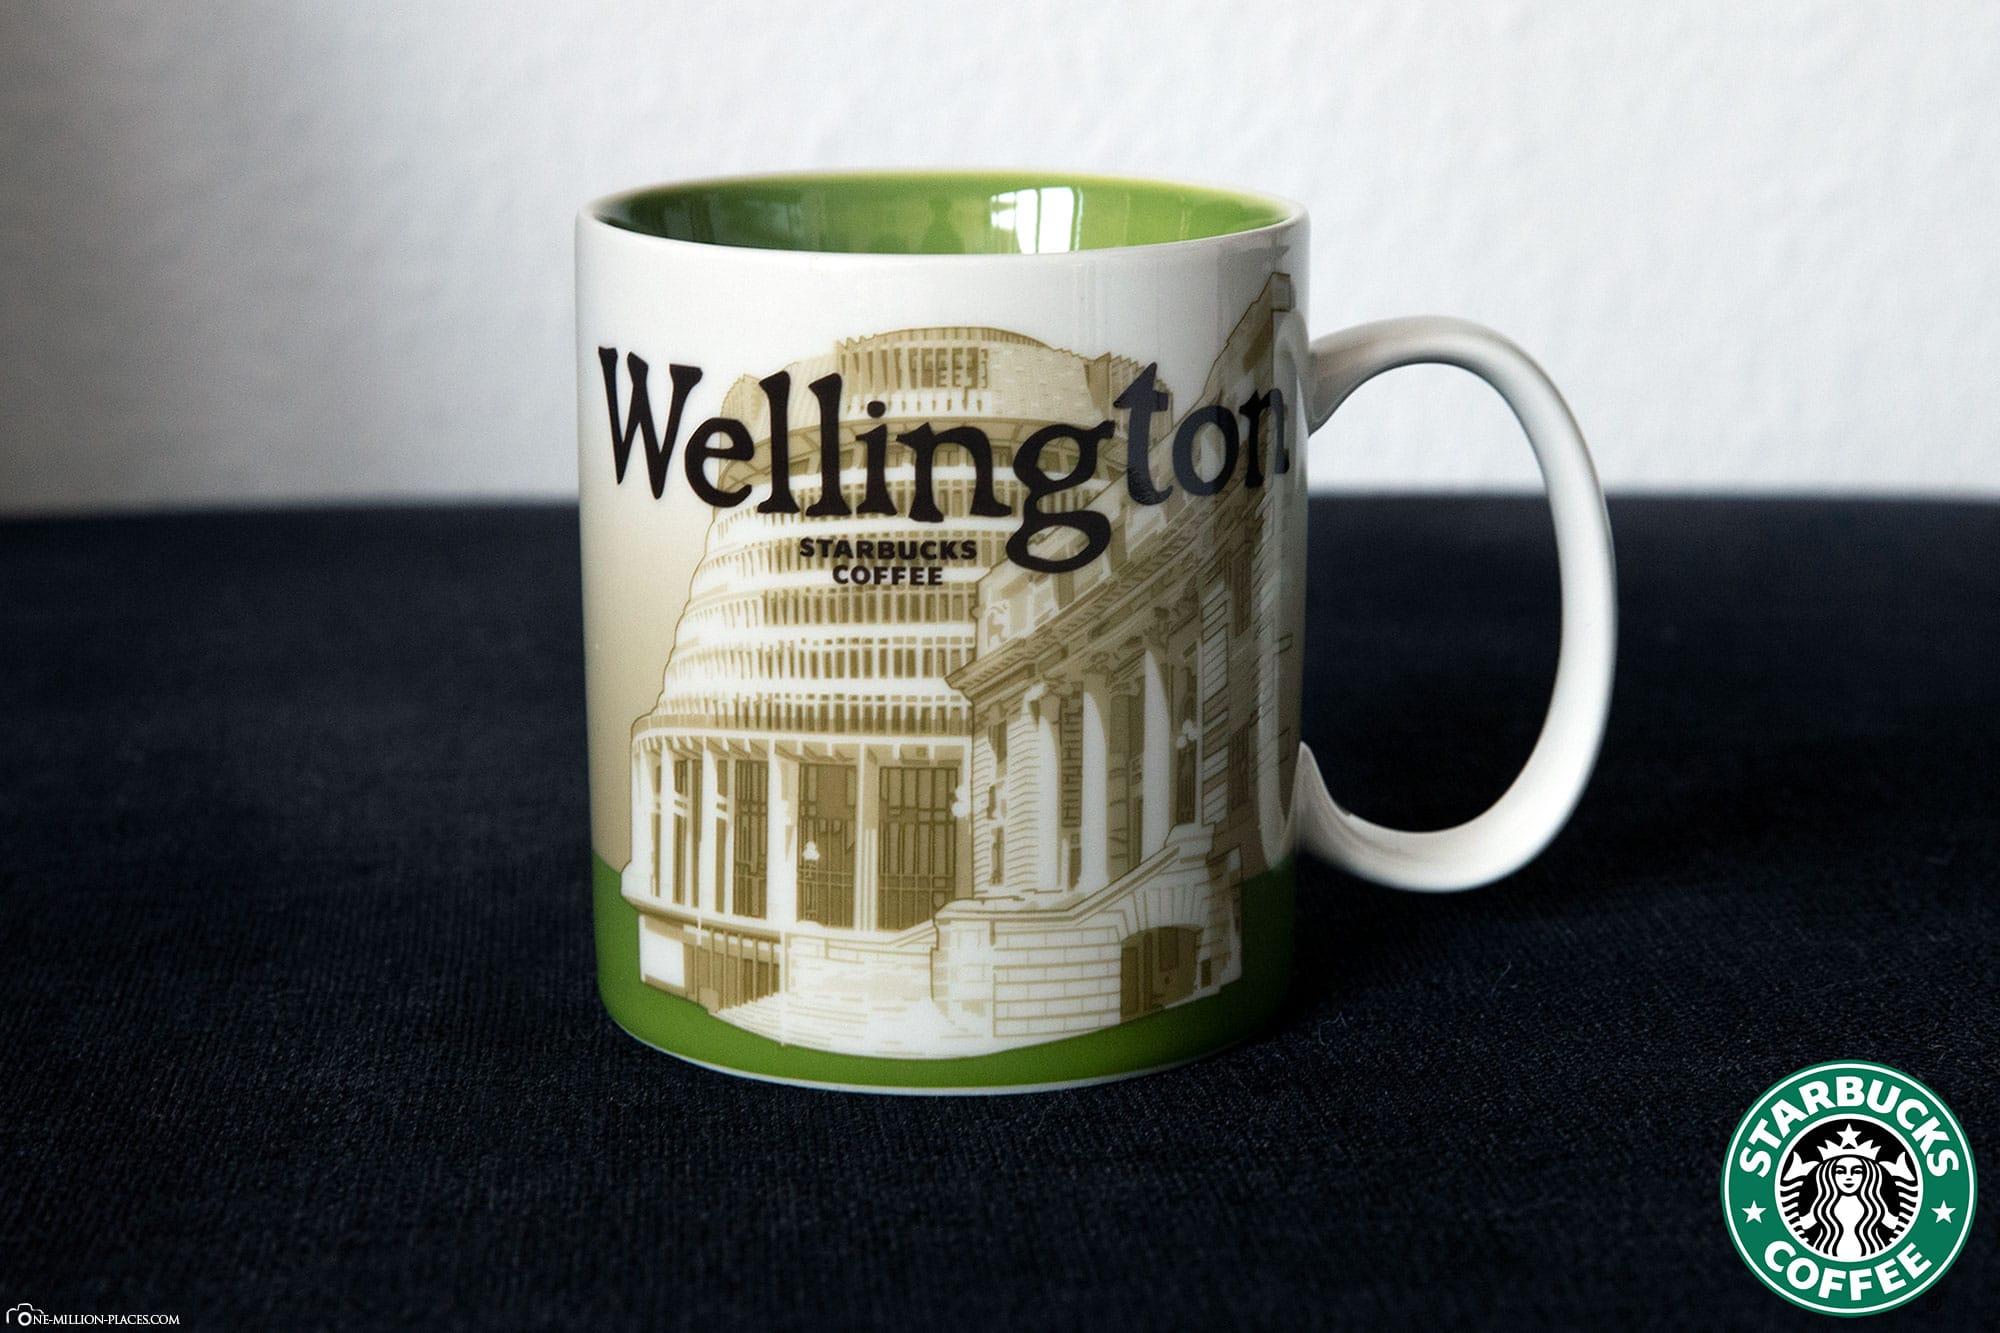 Wellington, Starbucks Tasse, Global Icon Serie, City Mugs, Sammlung, Neuseeland, Reisebericht